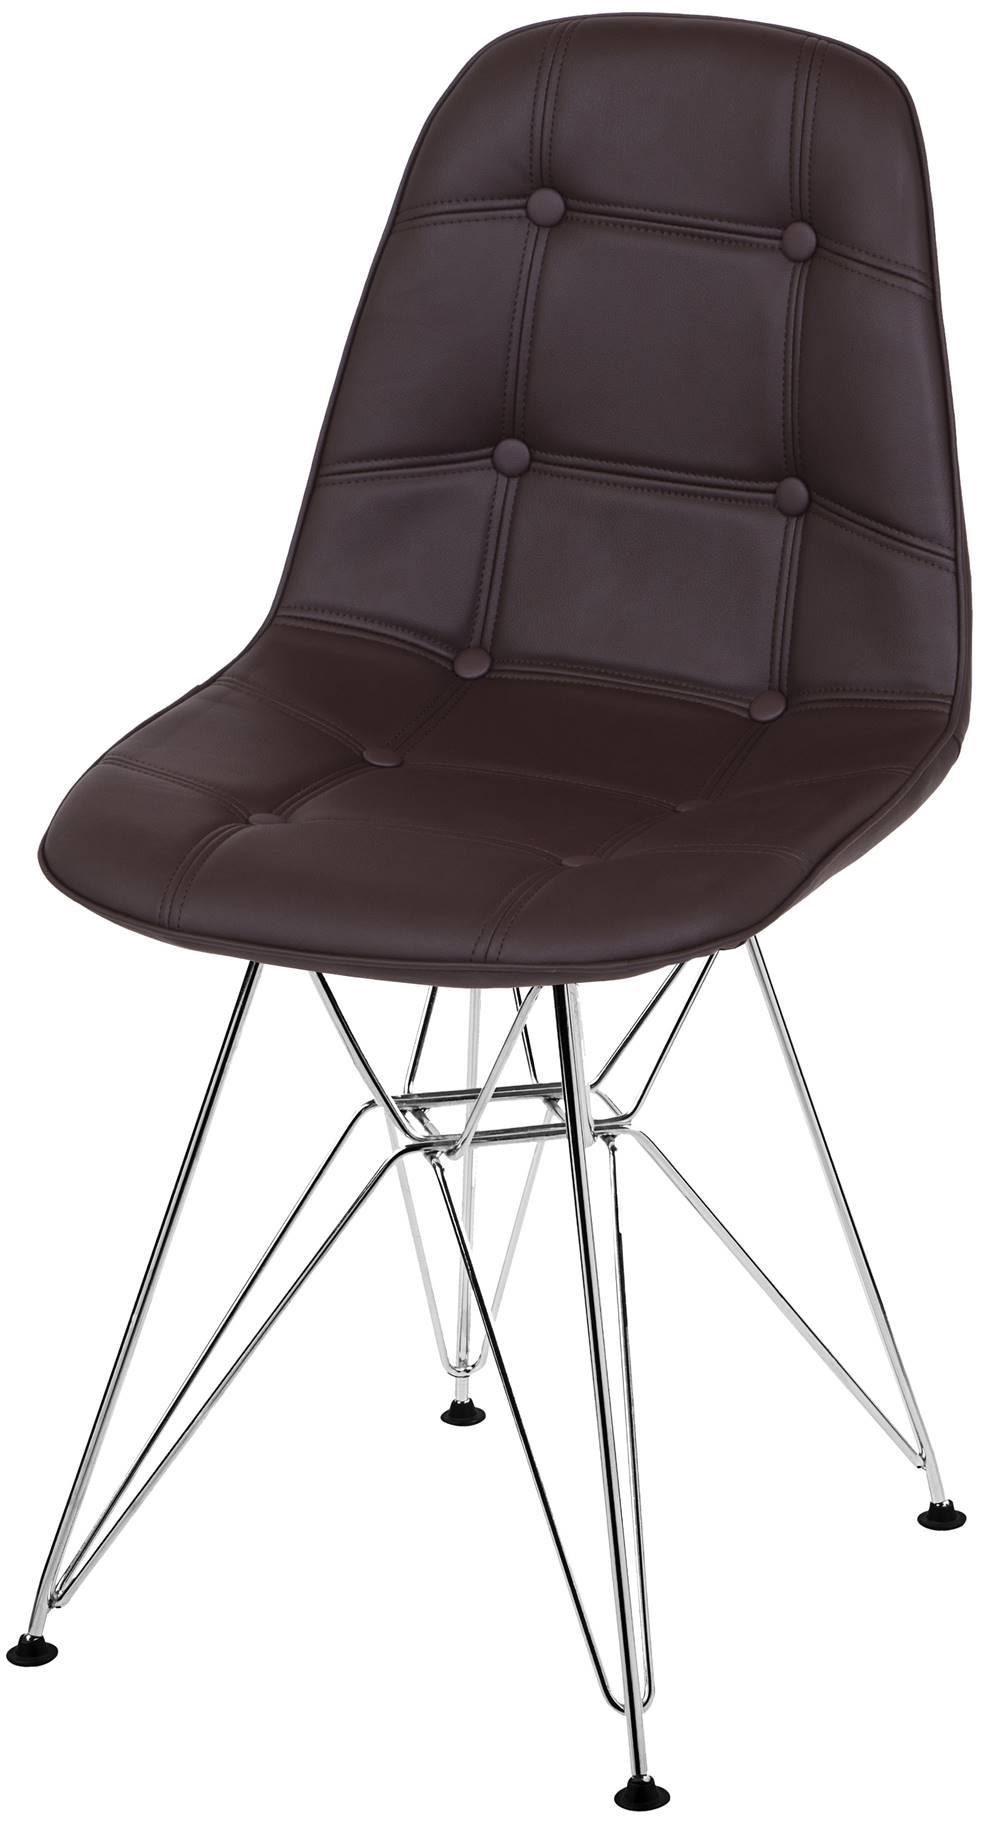 Cadeira Eames Botone Marrom Base Cromada - 39067